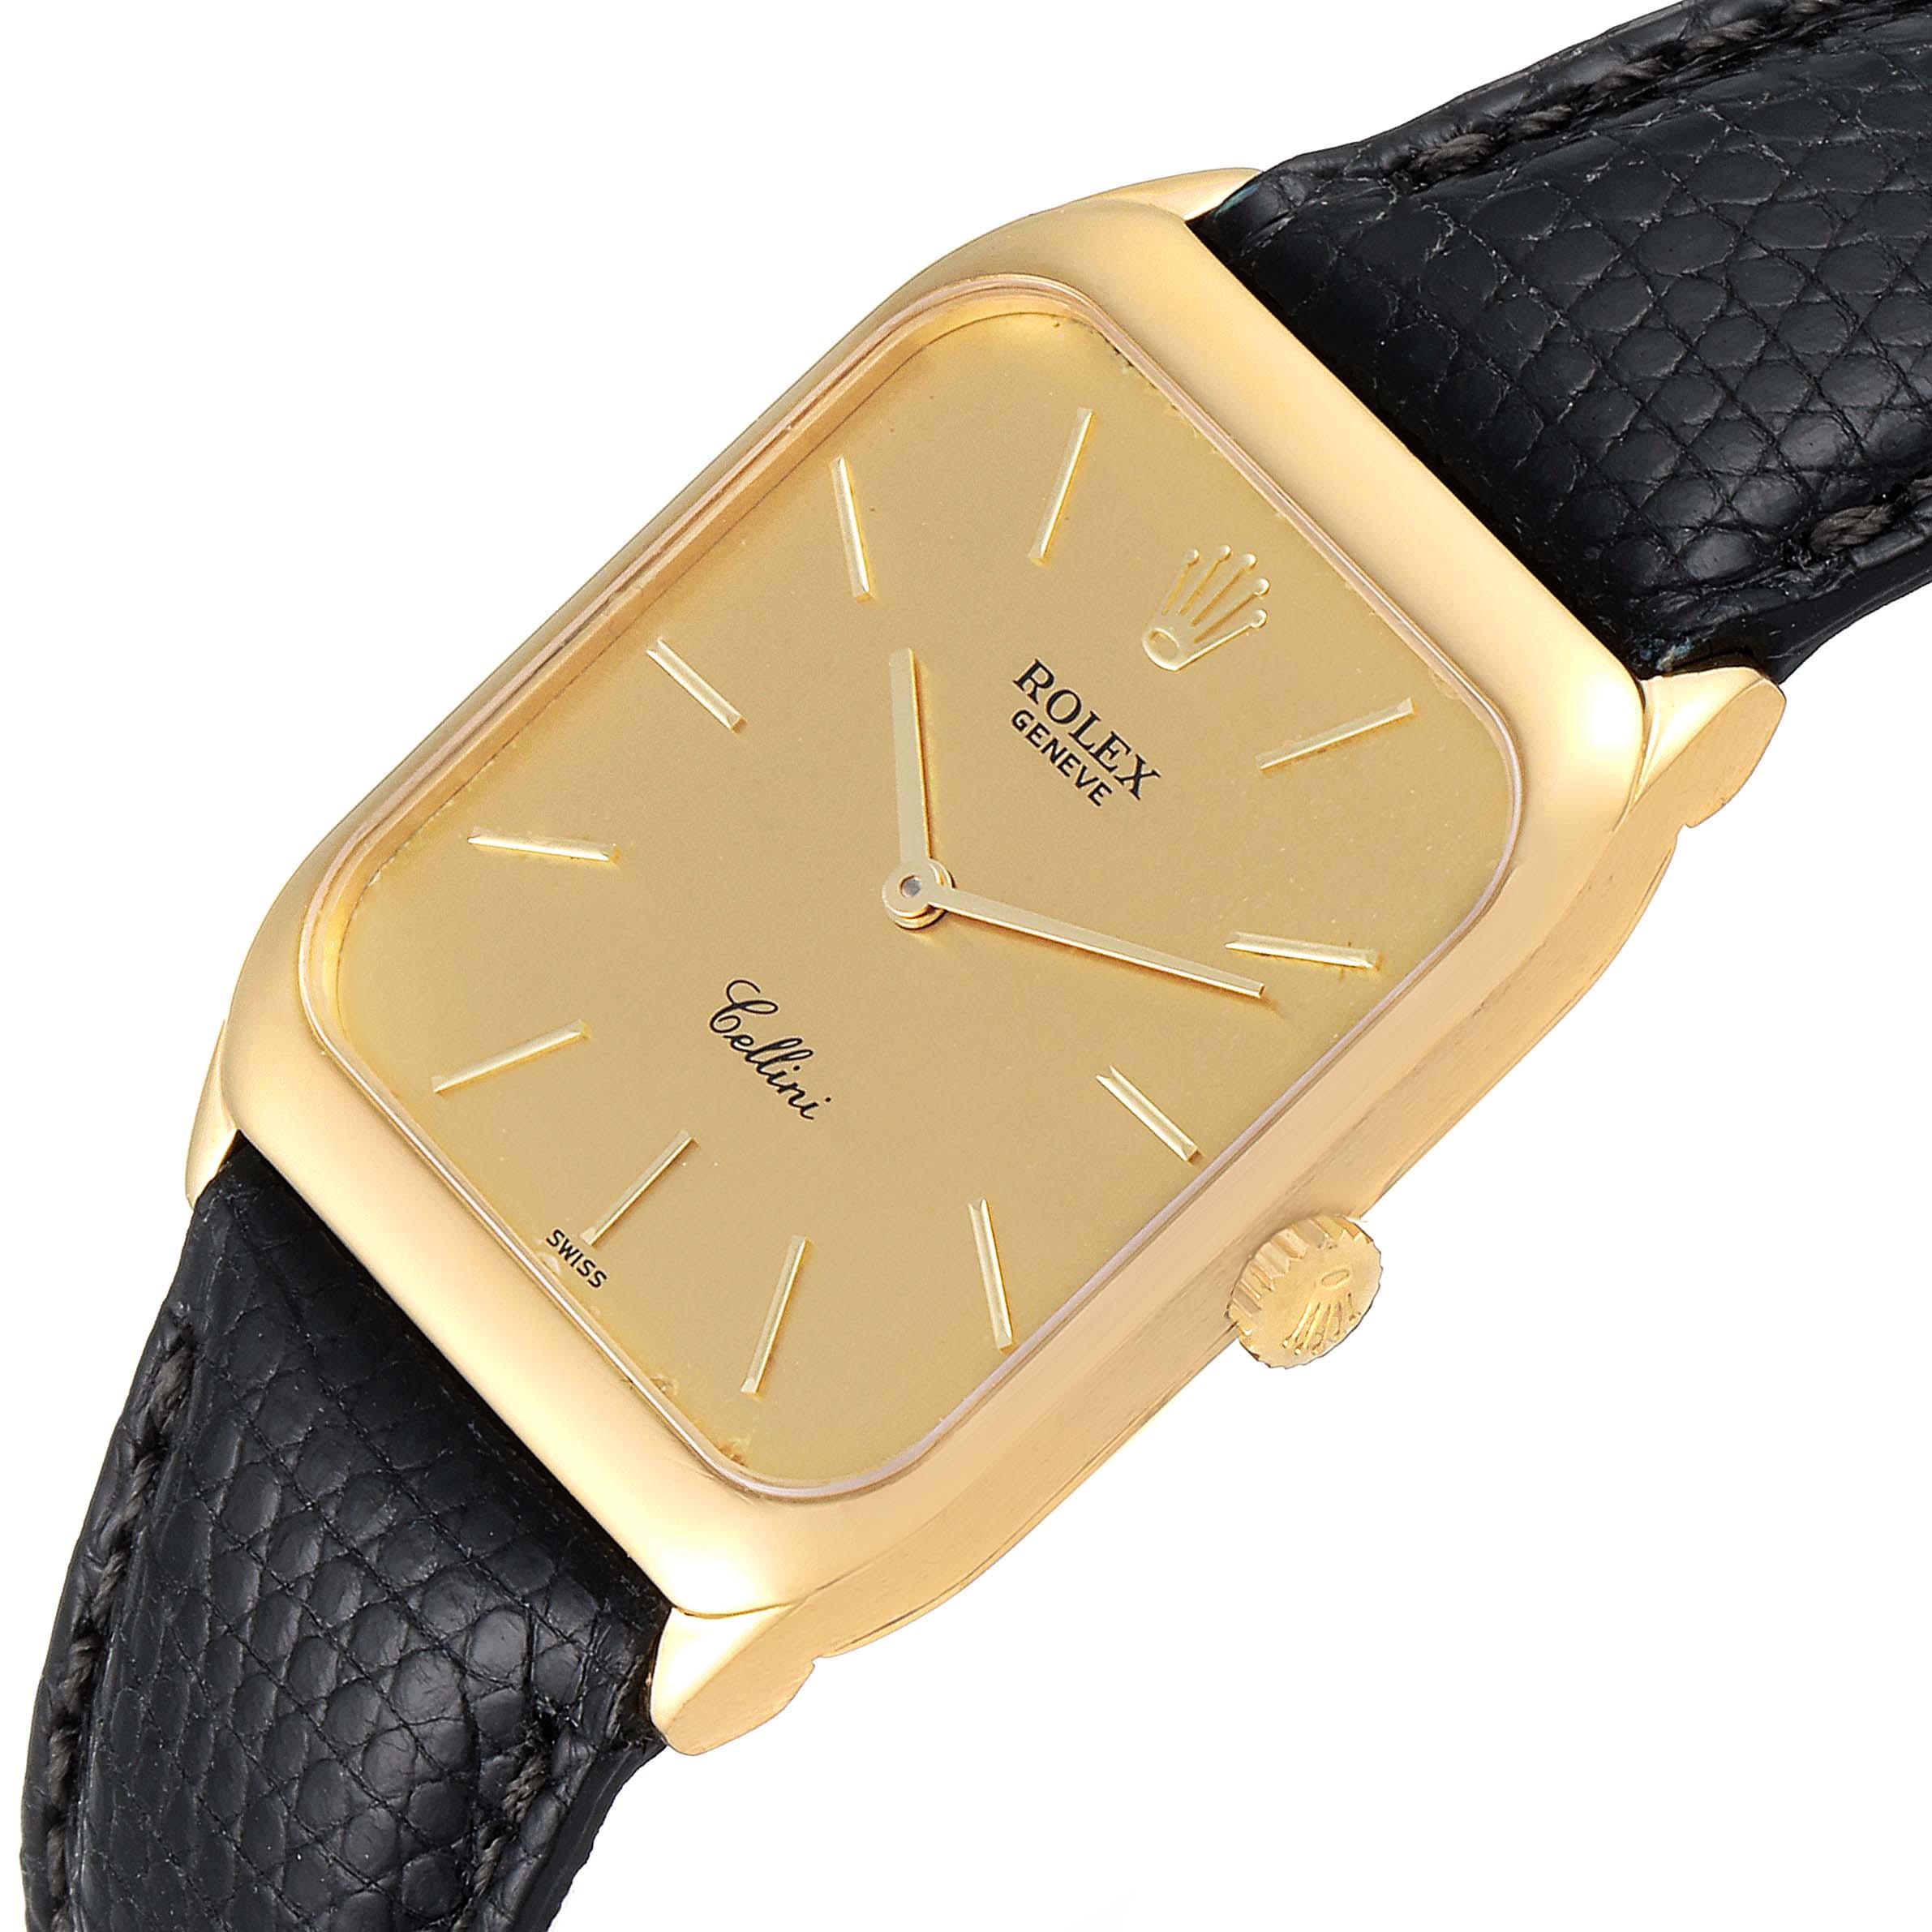 Rolex Cellini 18k Yellow Gold Black Strap Mens Vintage Watch 4135 SwissWatchExpo